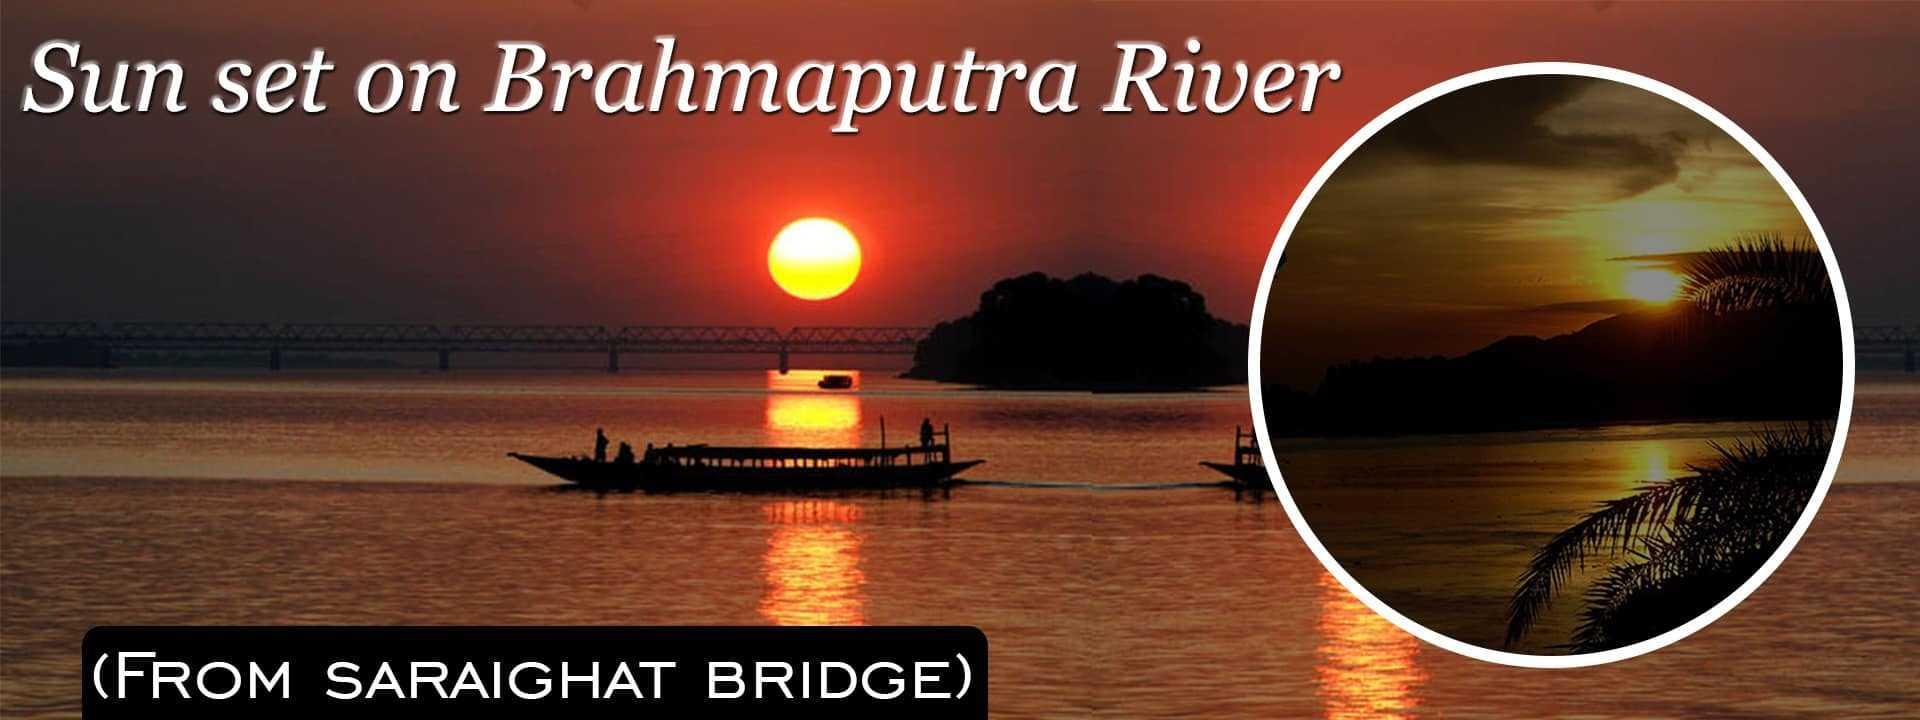 Sun set on Brahmaputra River